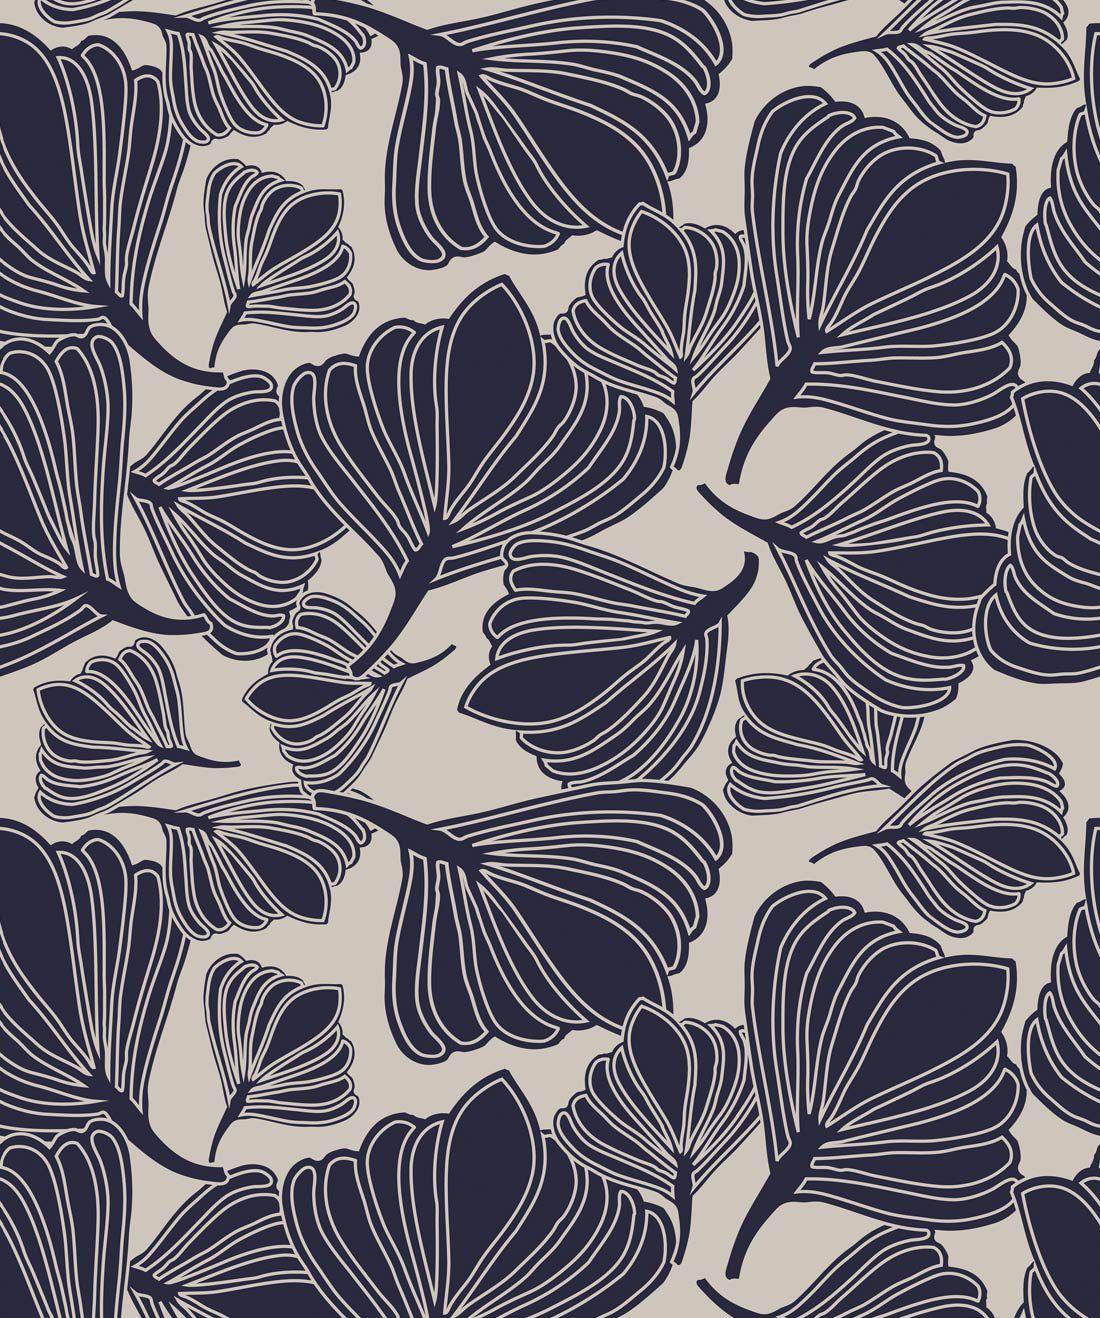 Tulip Seeds